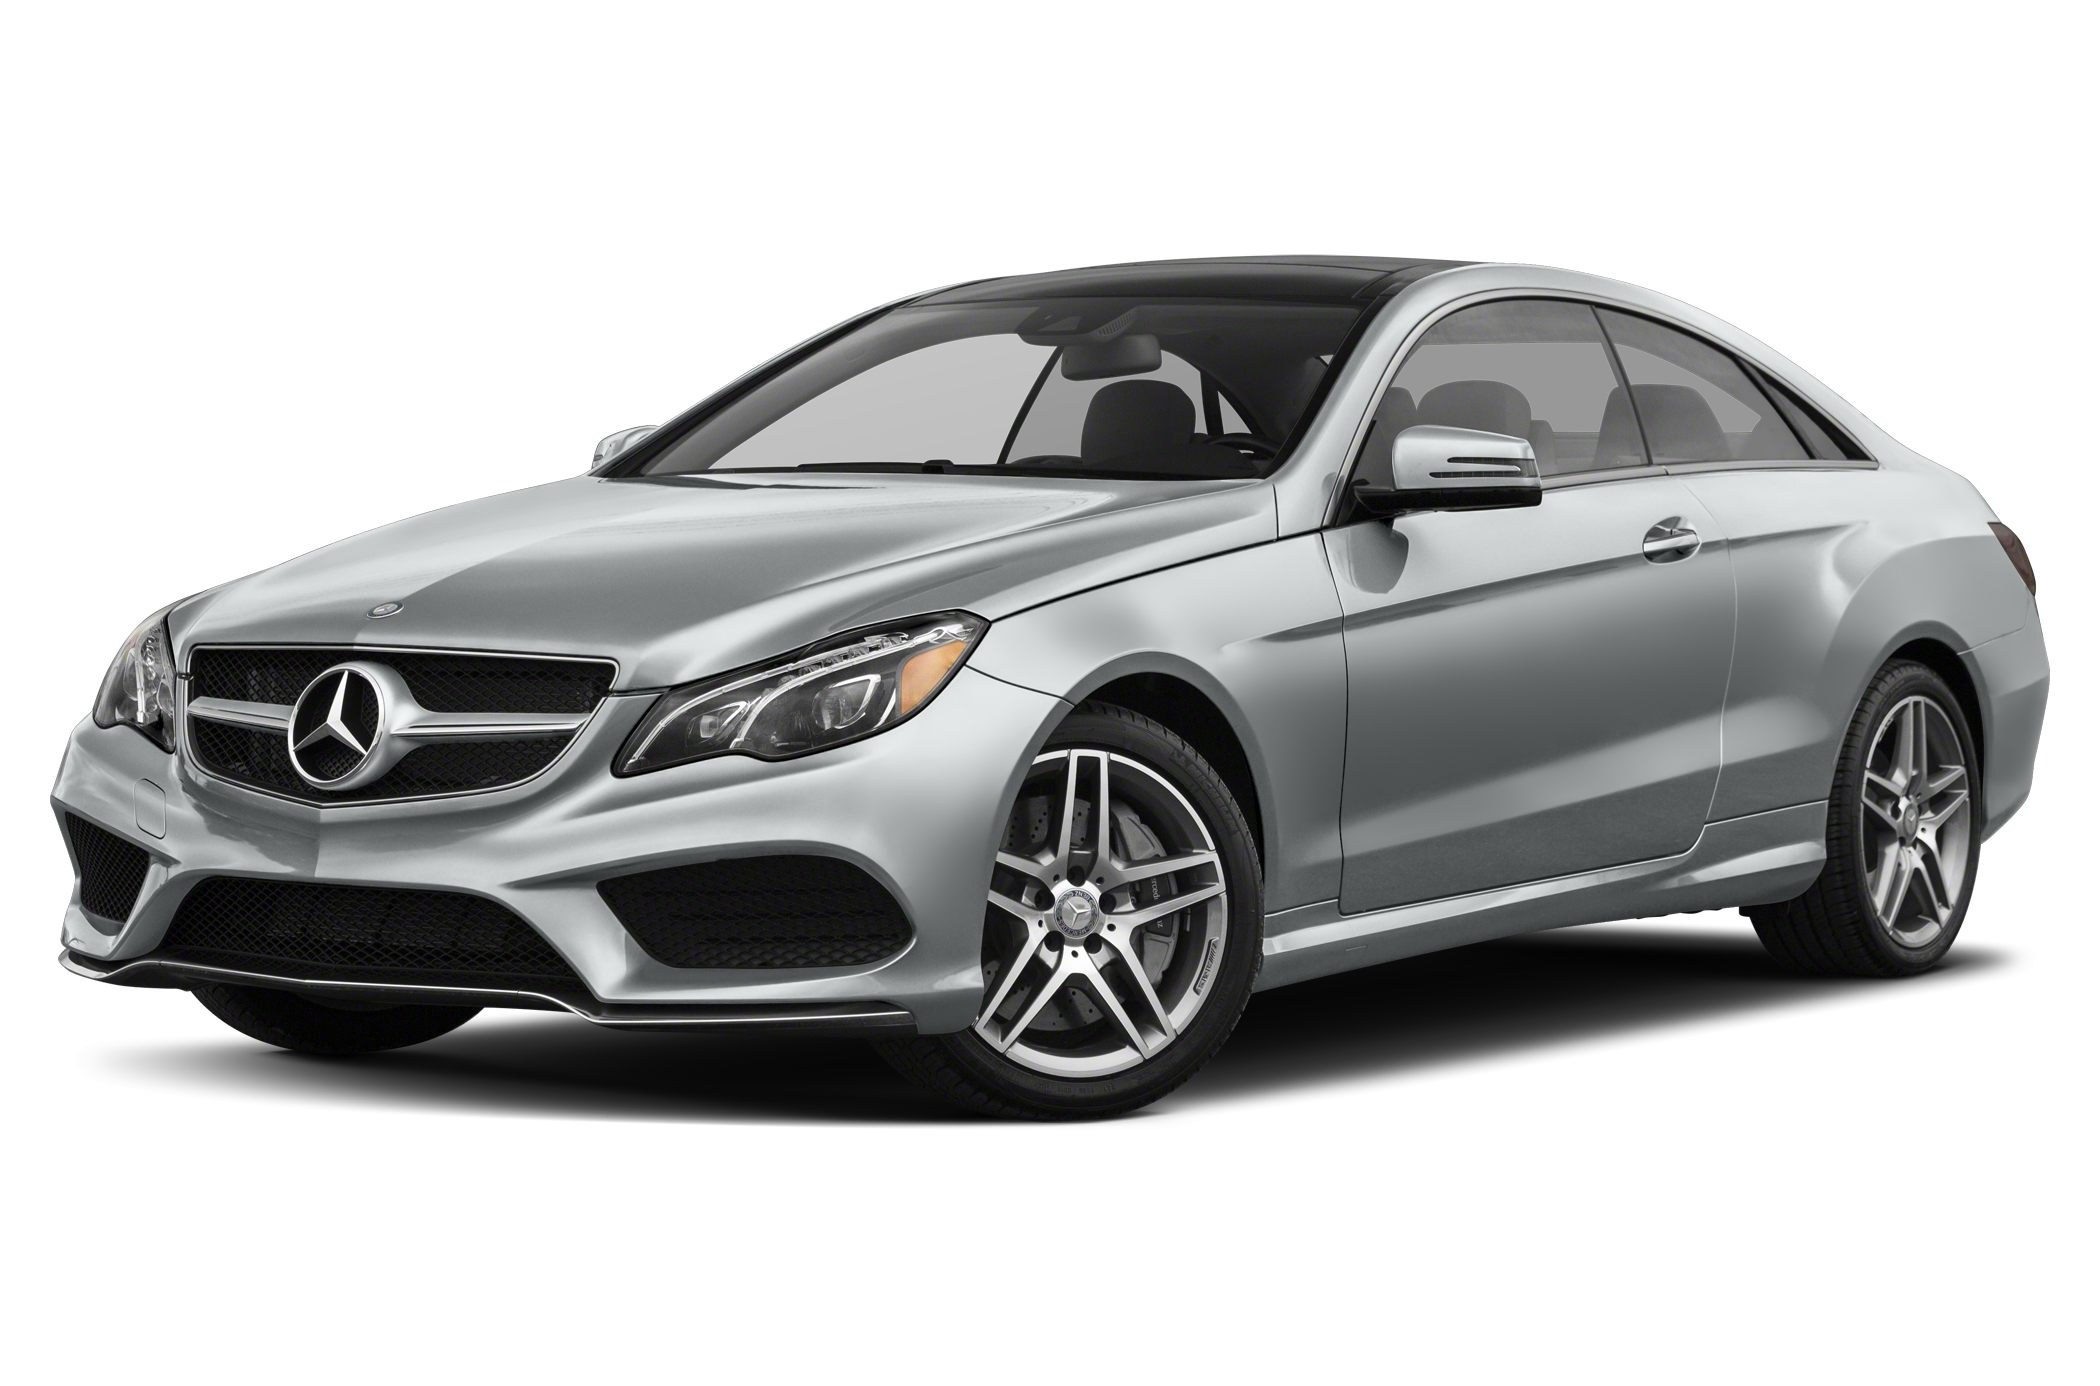 Mercedes Benz E 2017 Price >> 2017 Mercedes Benz E Class Deals Prices Incentives Leases